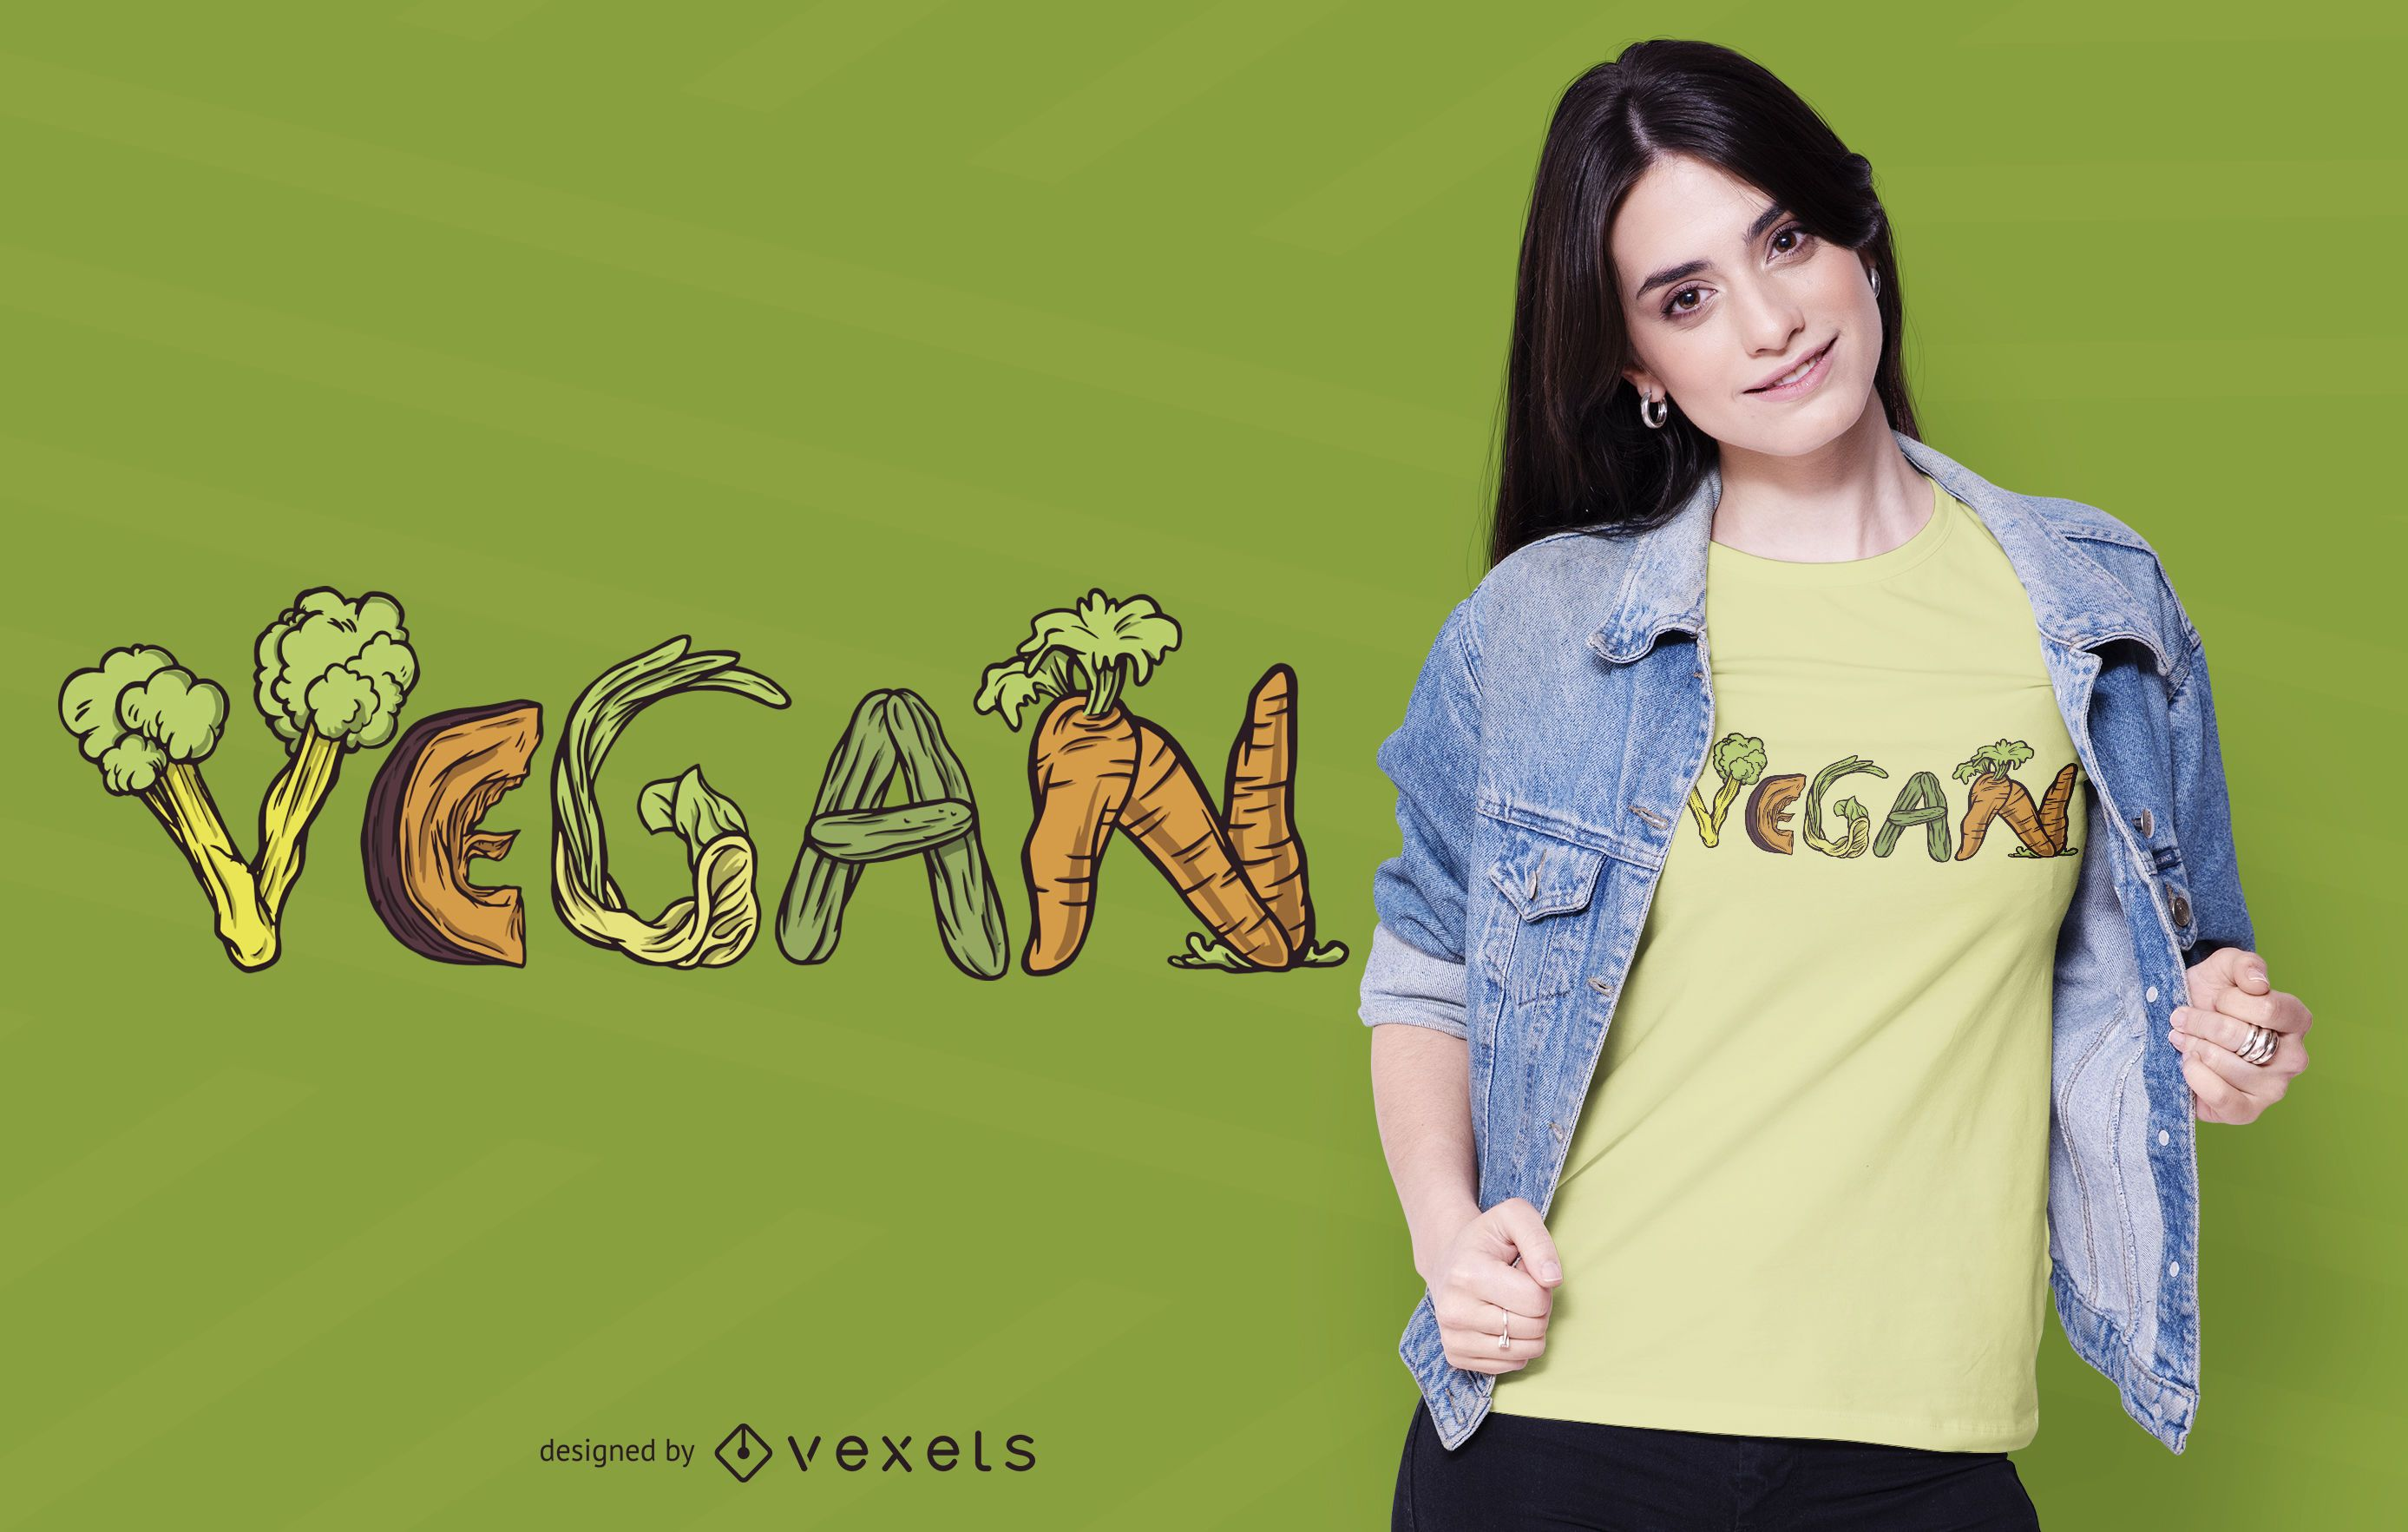 Vegan Vegetables T-shirt Design